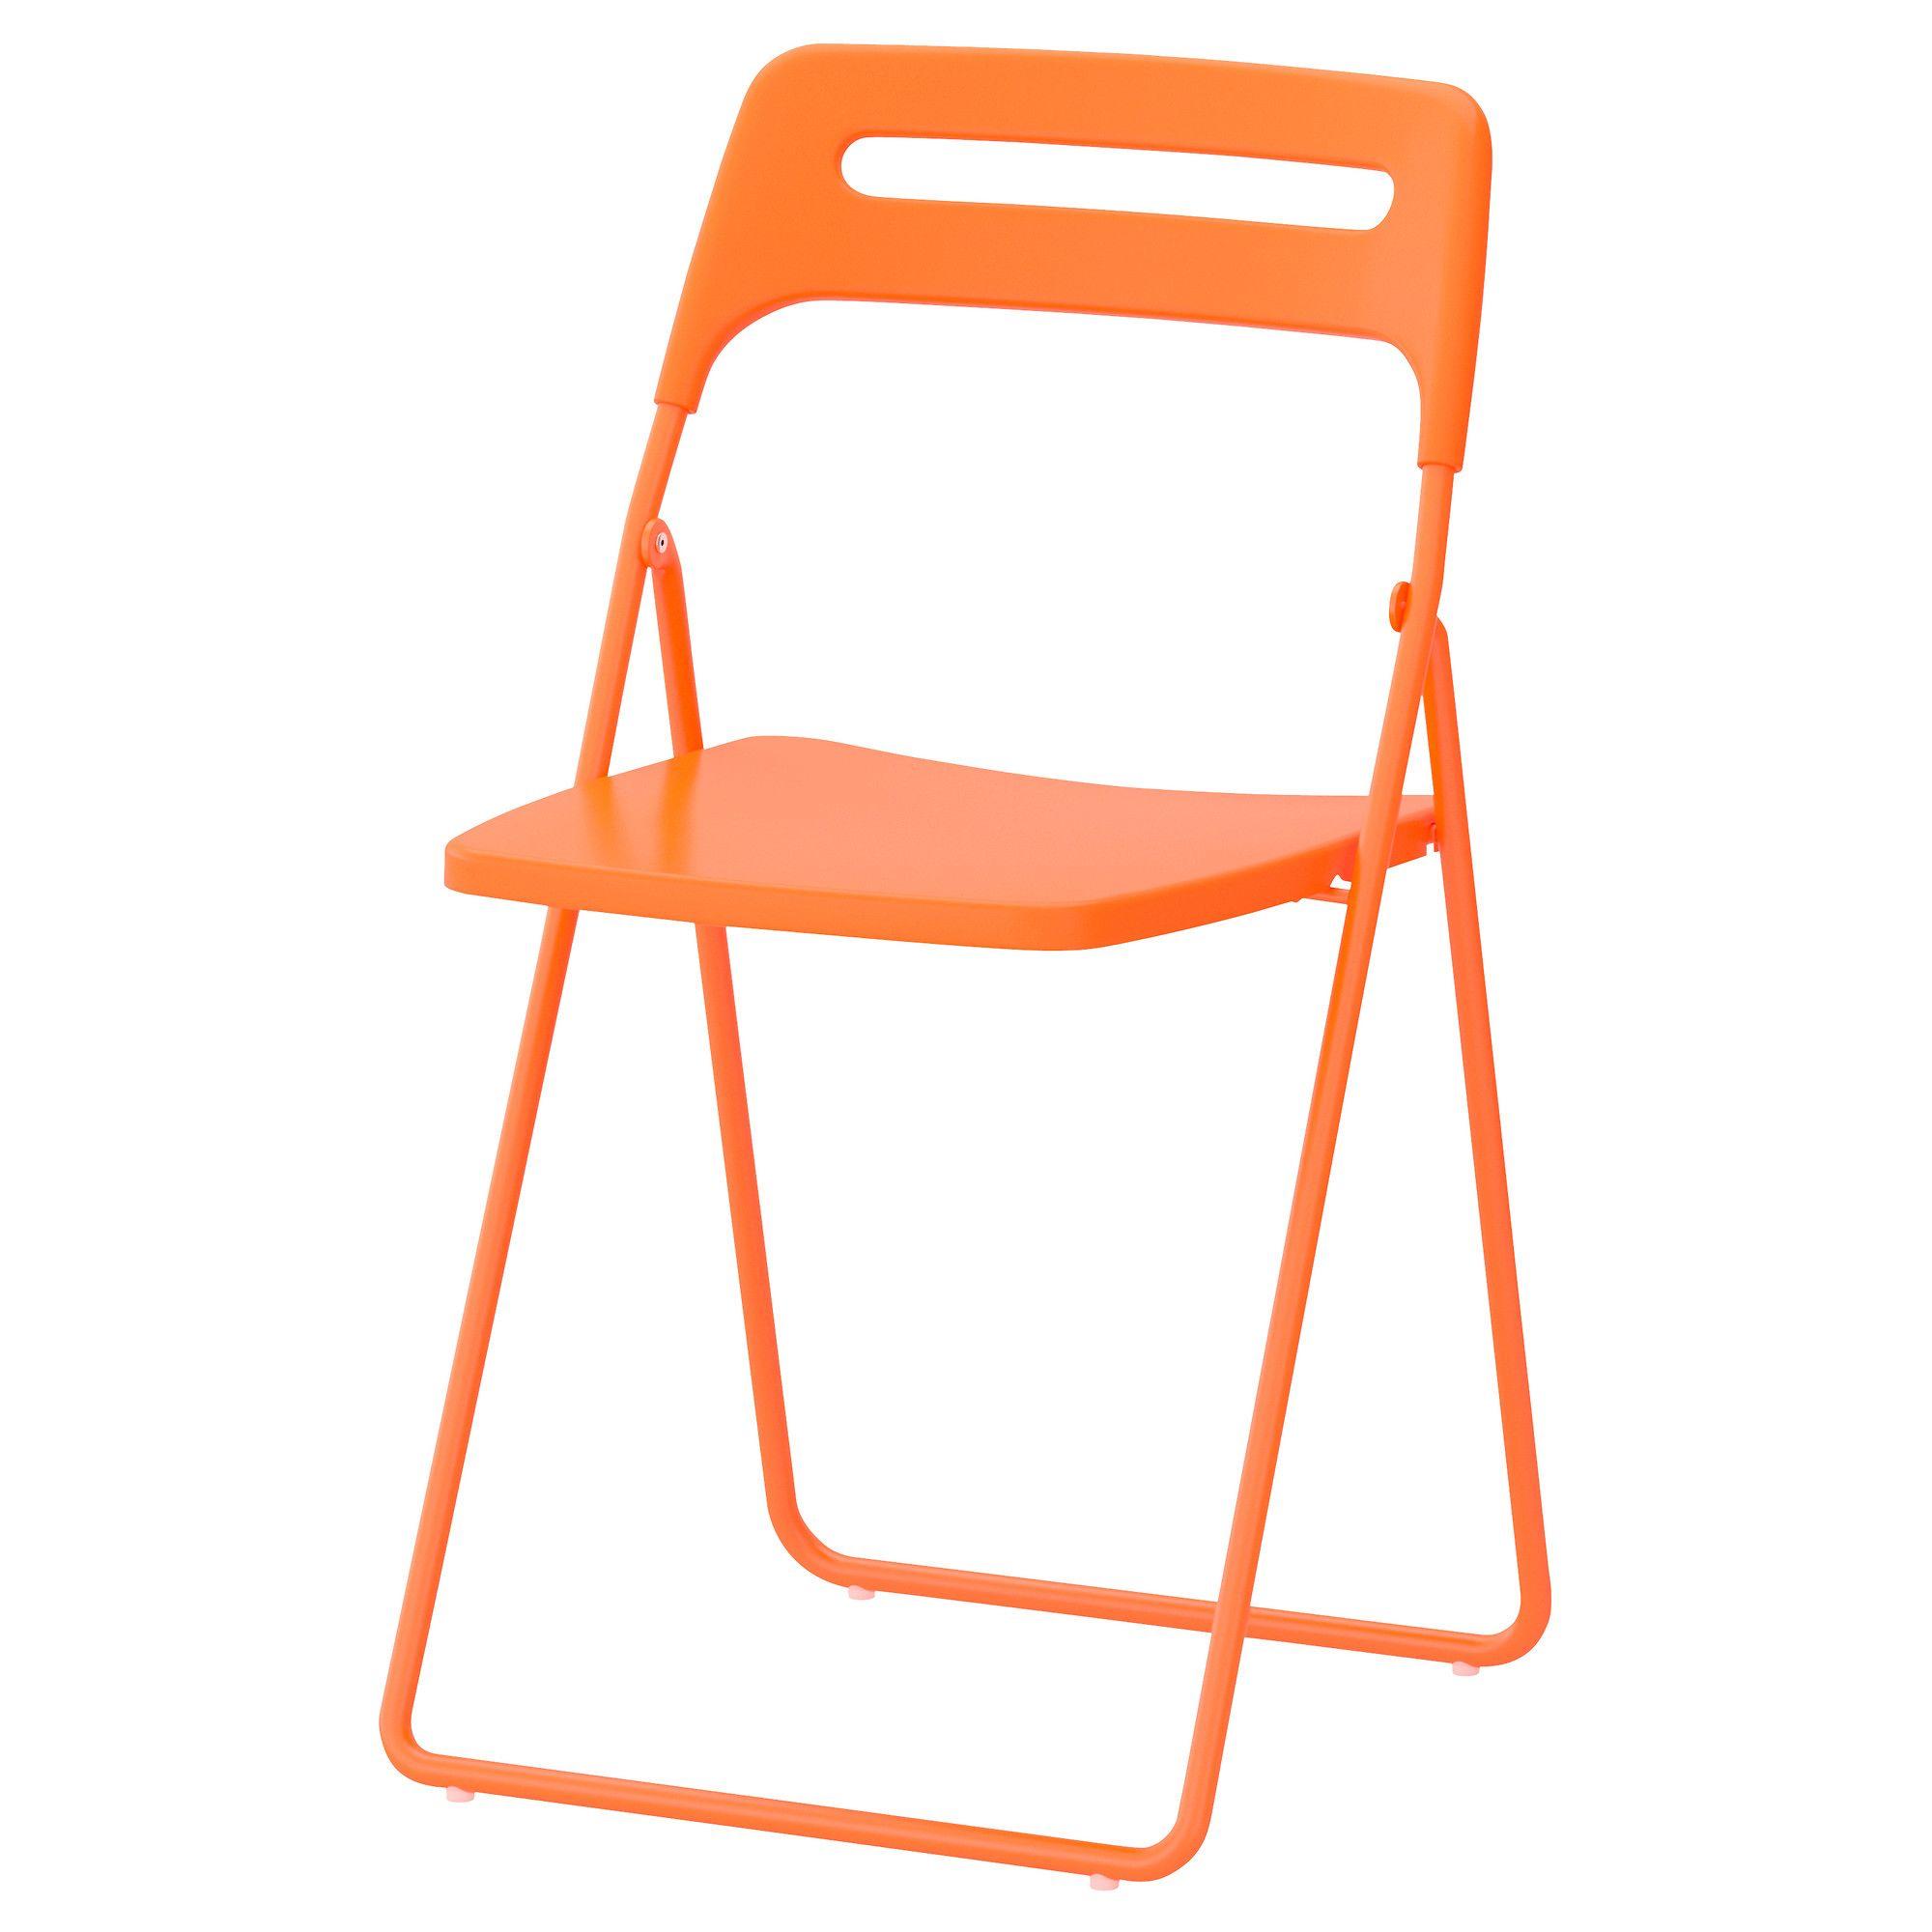 NISSE Folding Chair, Orange